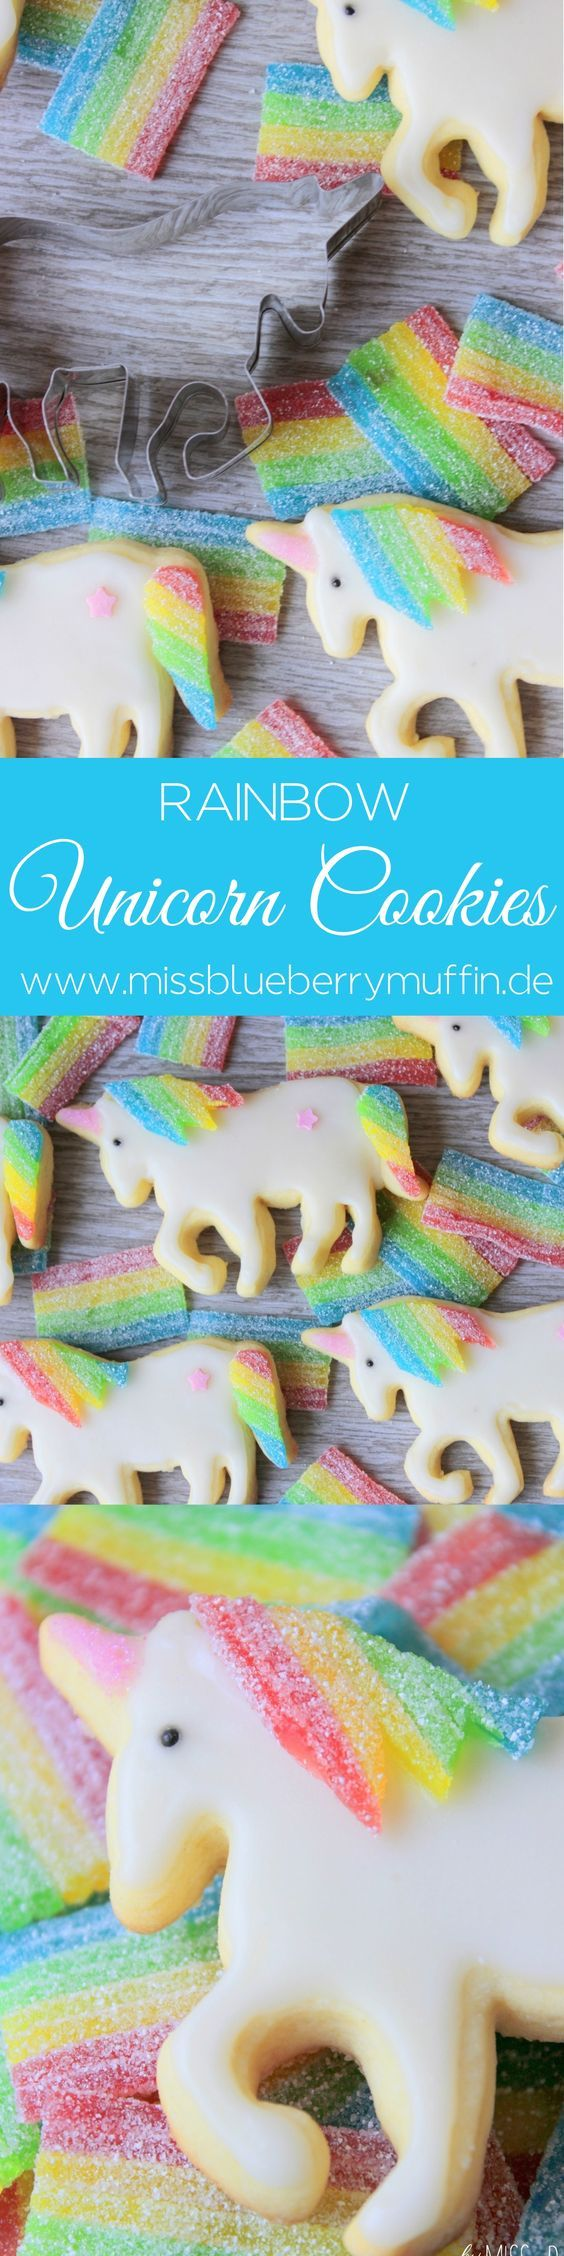 Regenbogen-Einhorn-Cookies! Süßer geht es nicht! <3 // Rainbow Unicorn Cookies   foodieeee   Pinterest